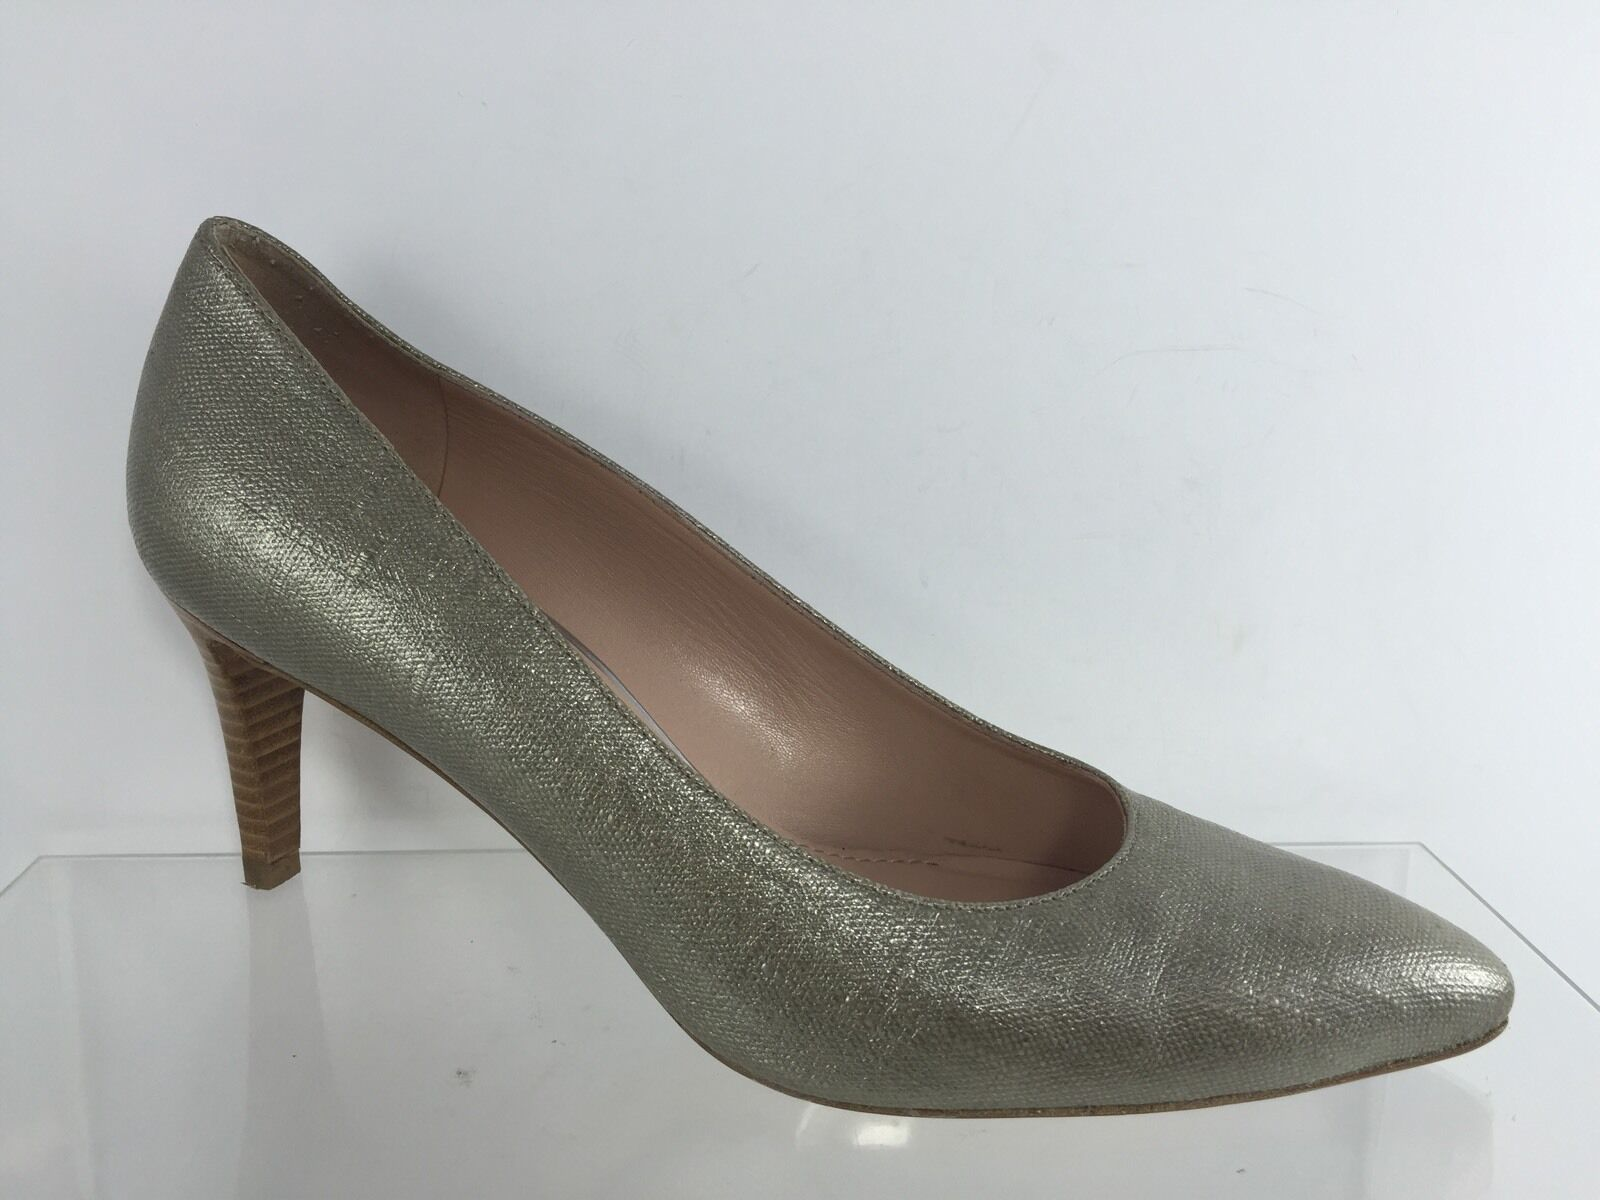 Stuart Weitzman Womens Pewter Heels 9.5 M